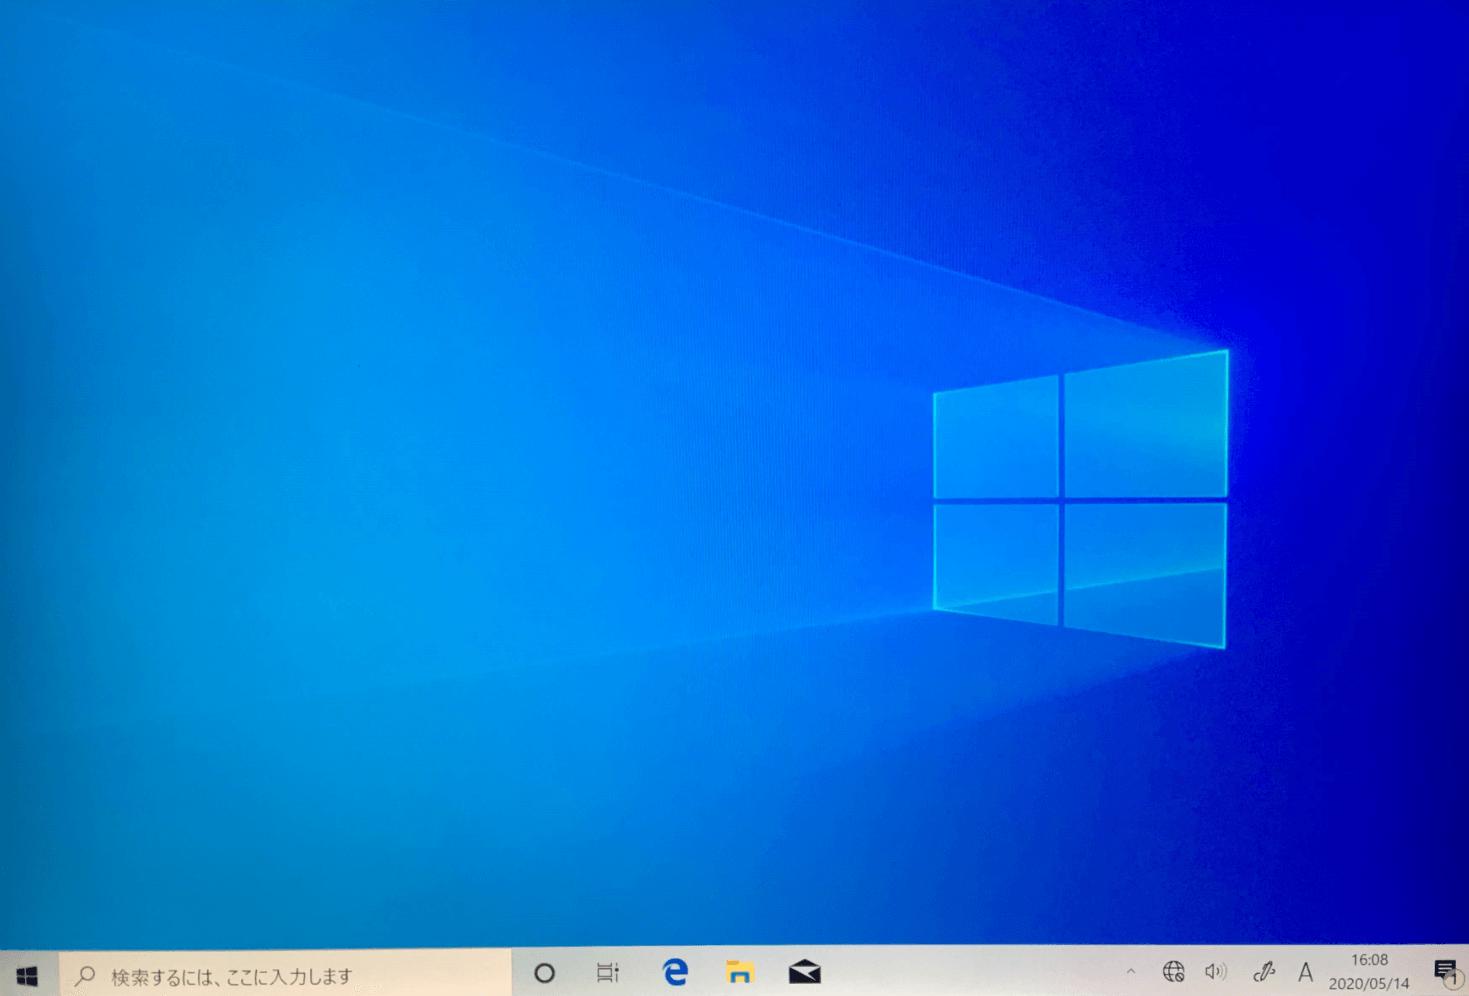 Windows 10USBメモリを使用したクリーンインストールの完了